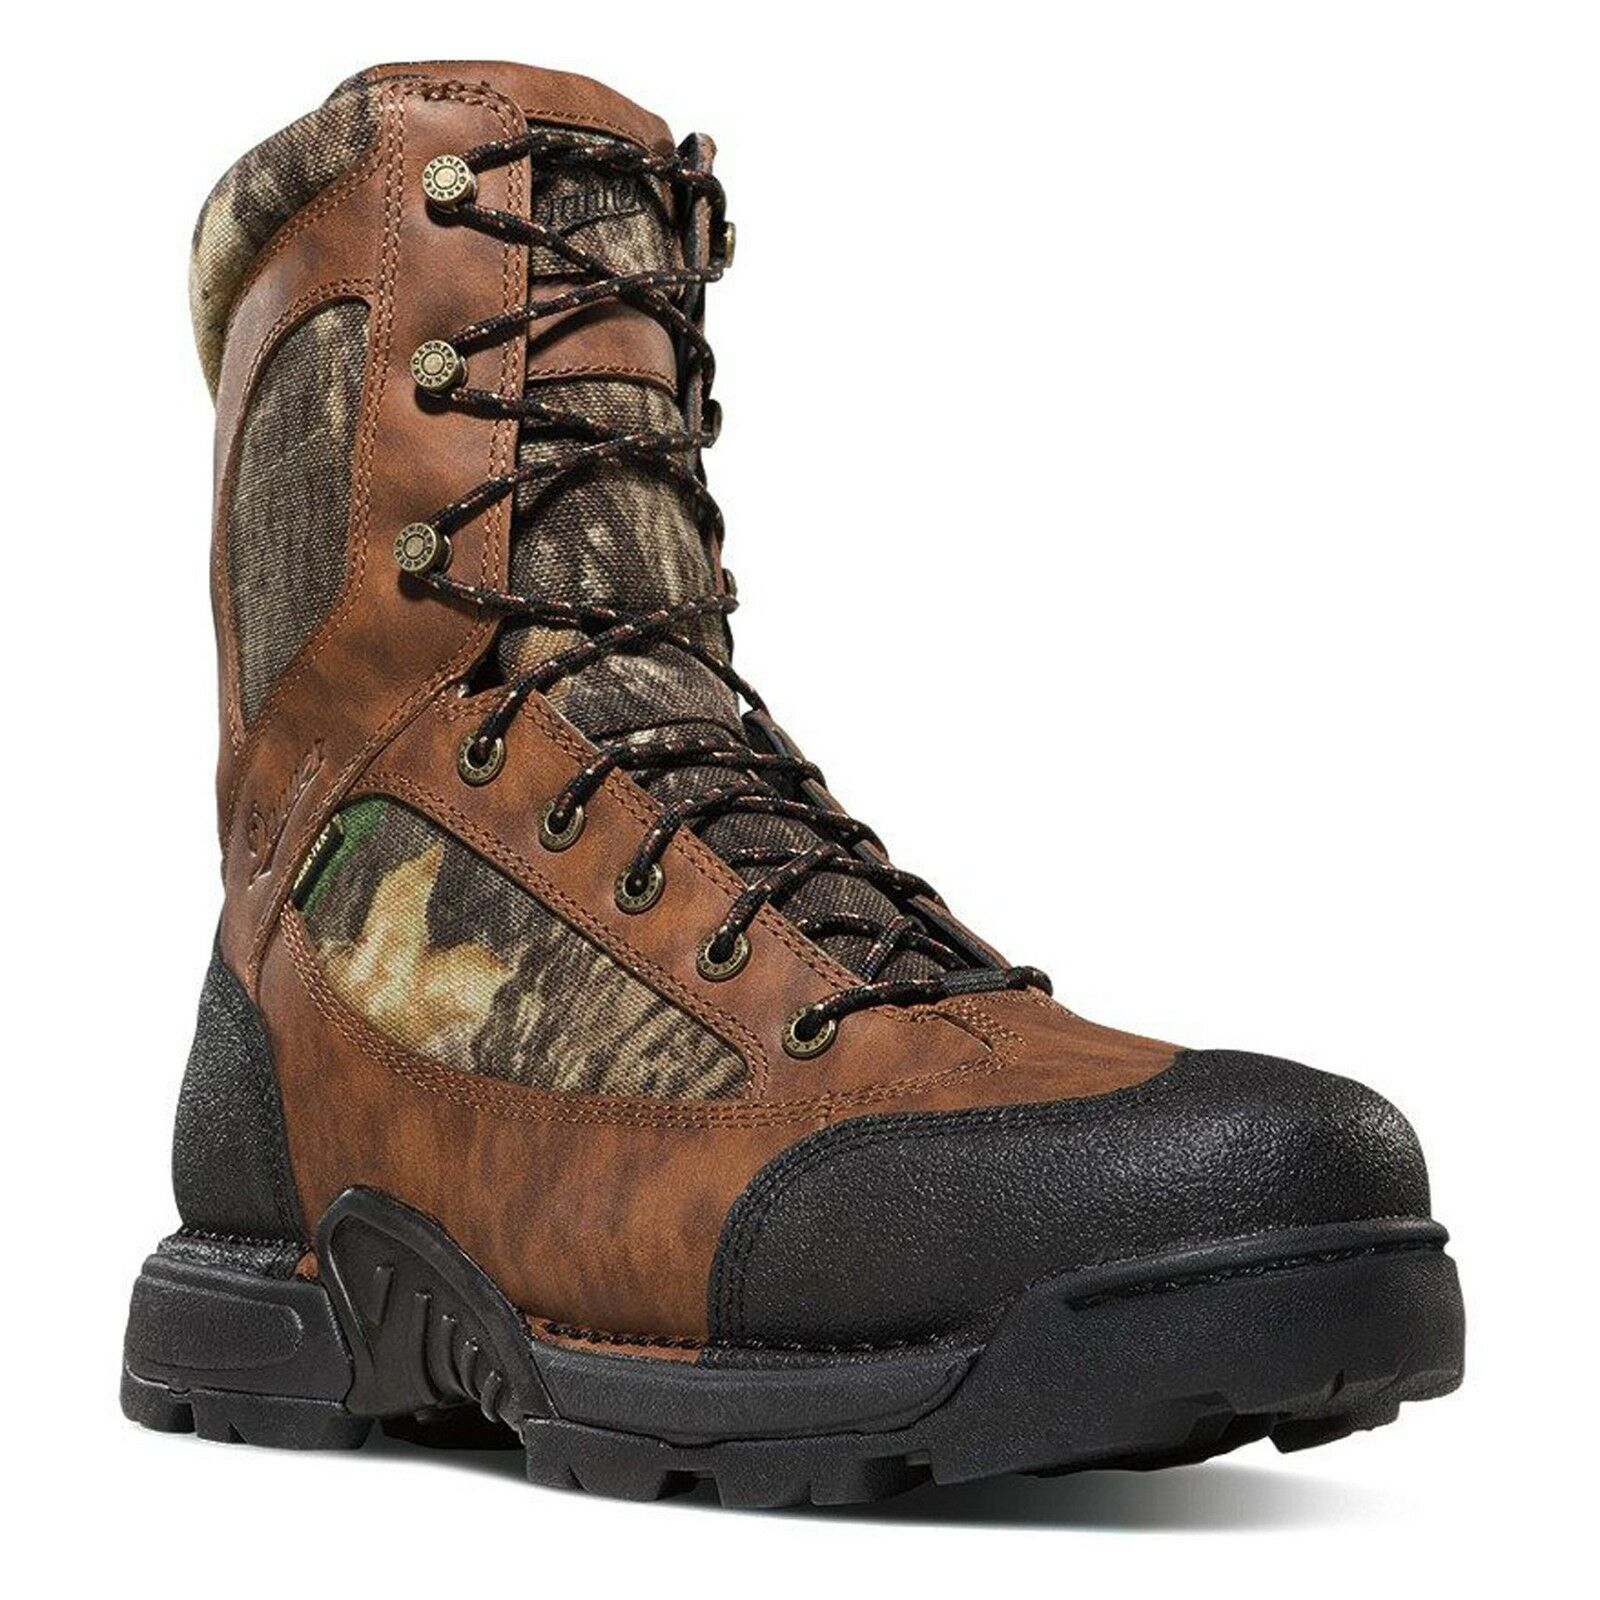 NEW Danner Danner Danner Pronghorn Mossy Oak 400 gram Hunting Stiefel, 8 , Leather Nylon, MOBU 2c2b6d